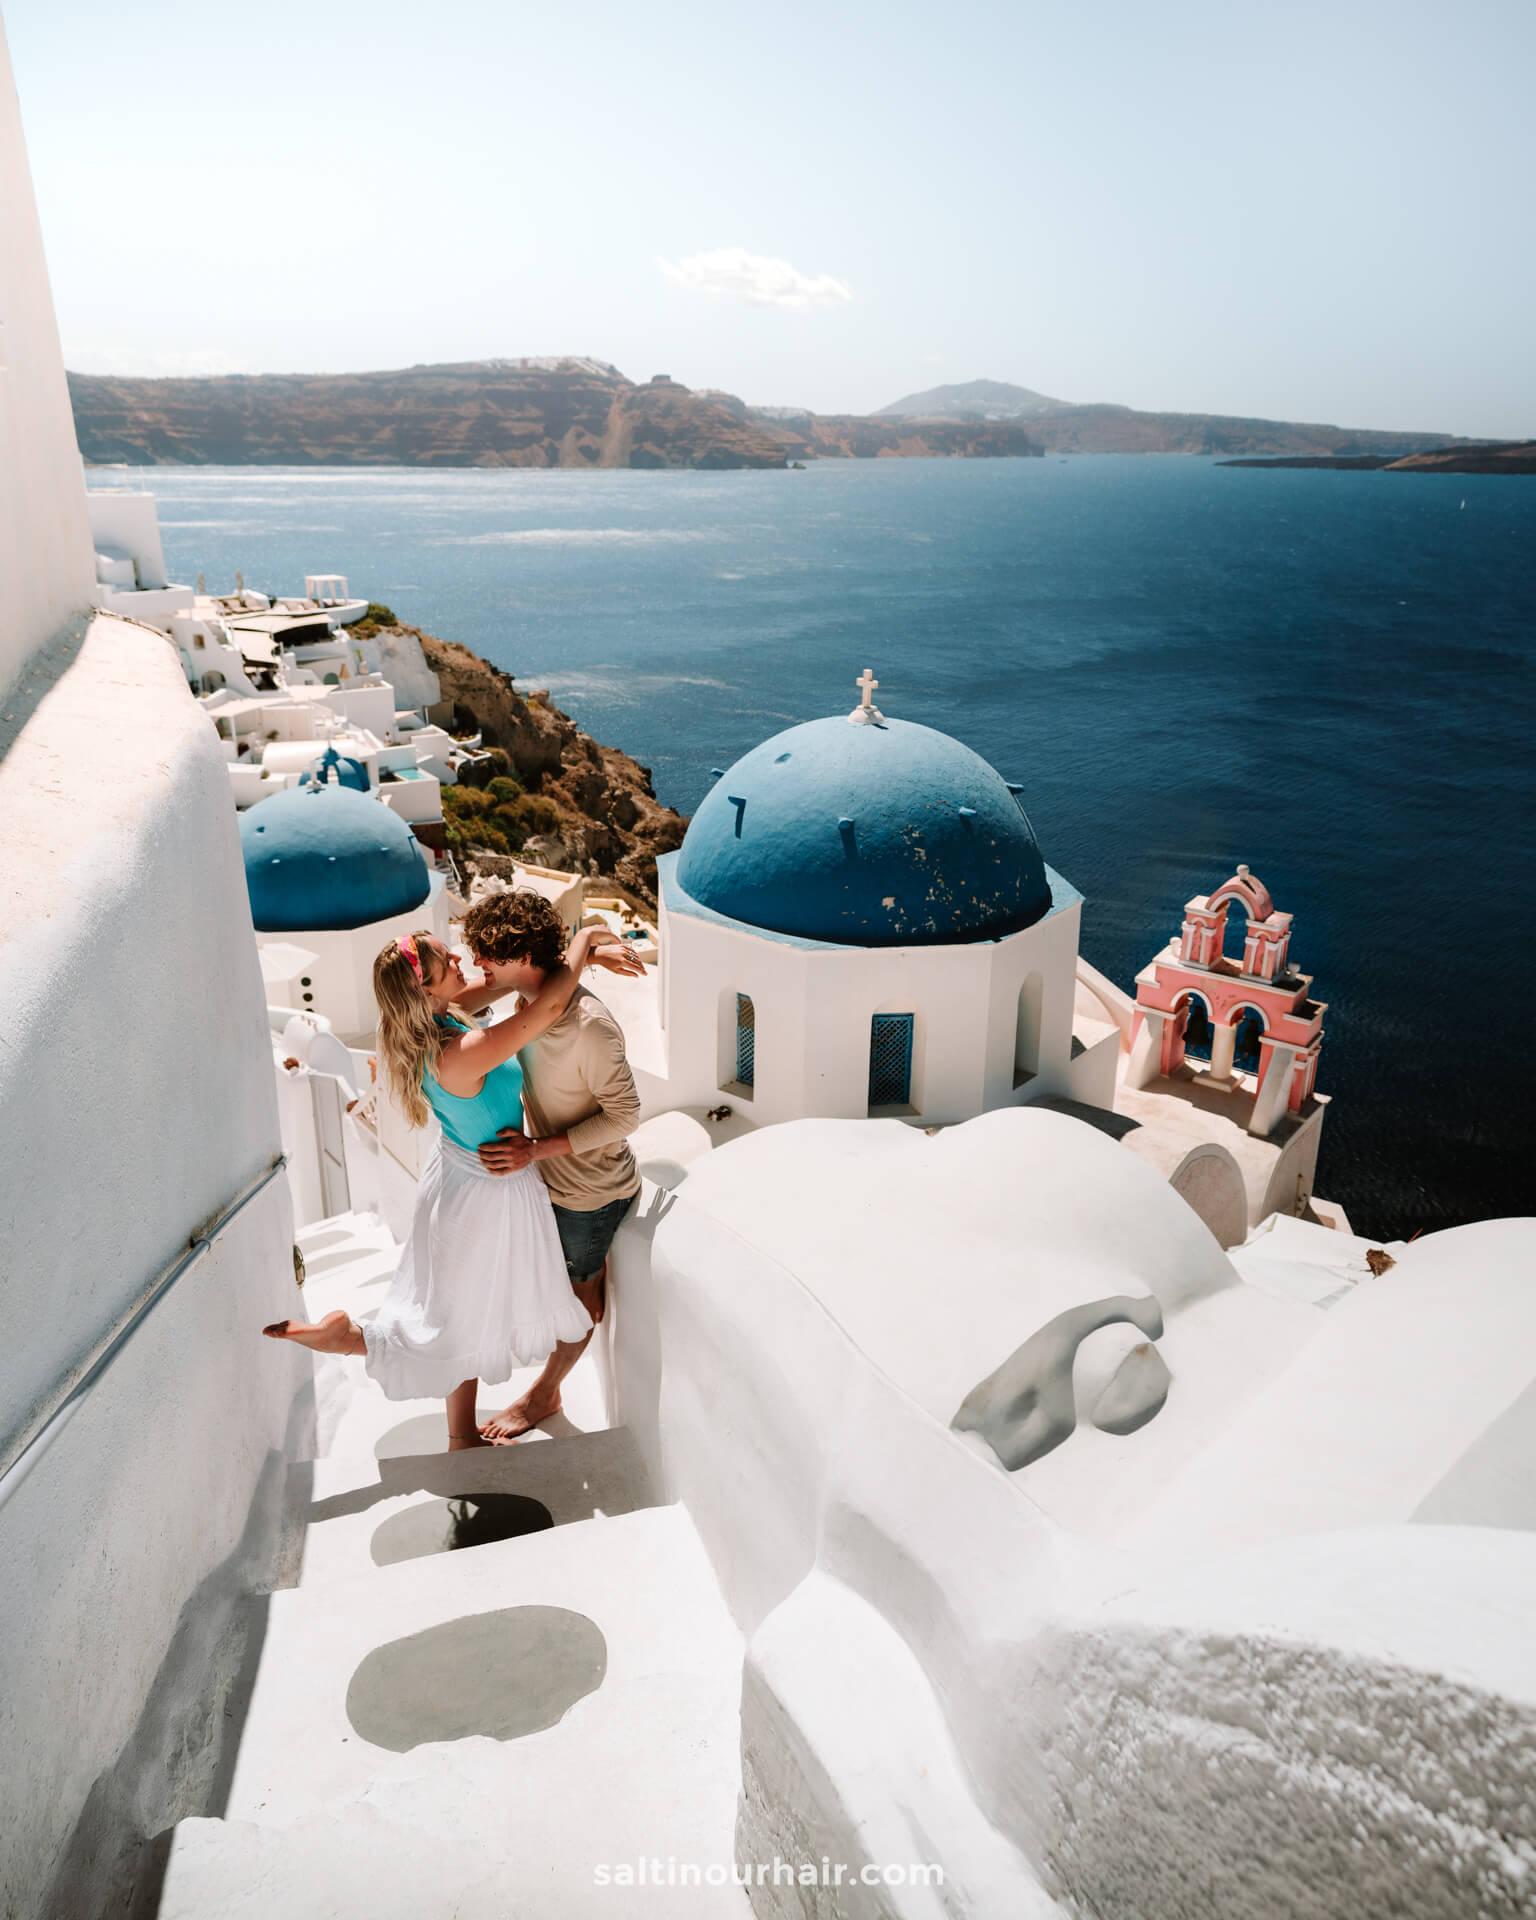 santorini greece oia